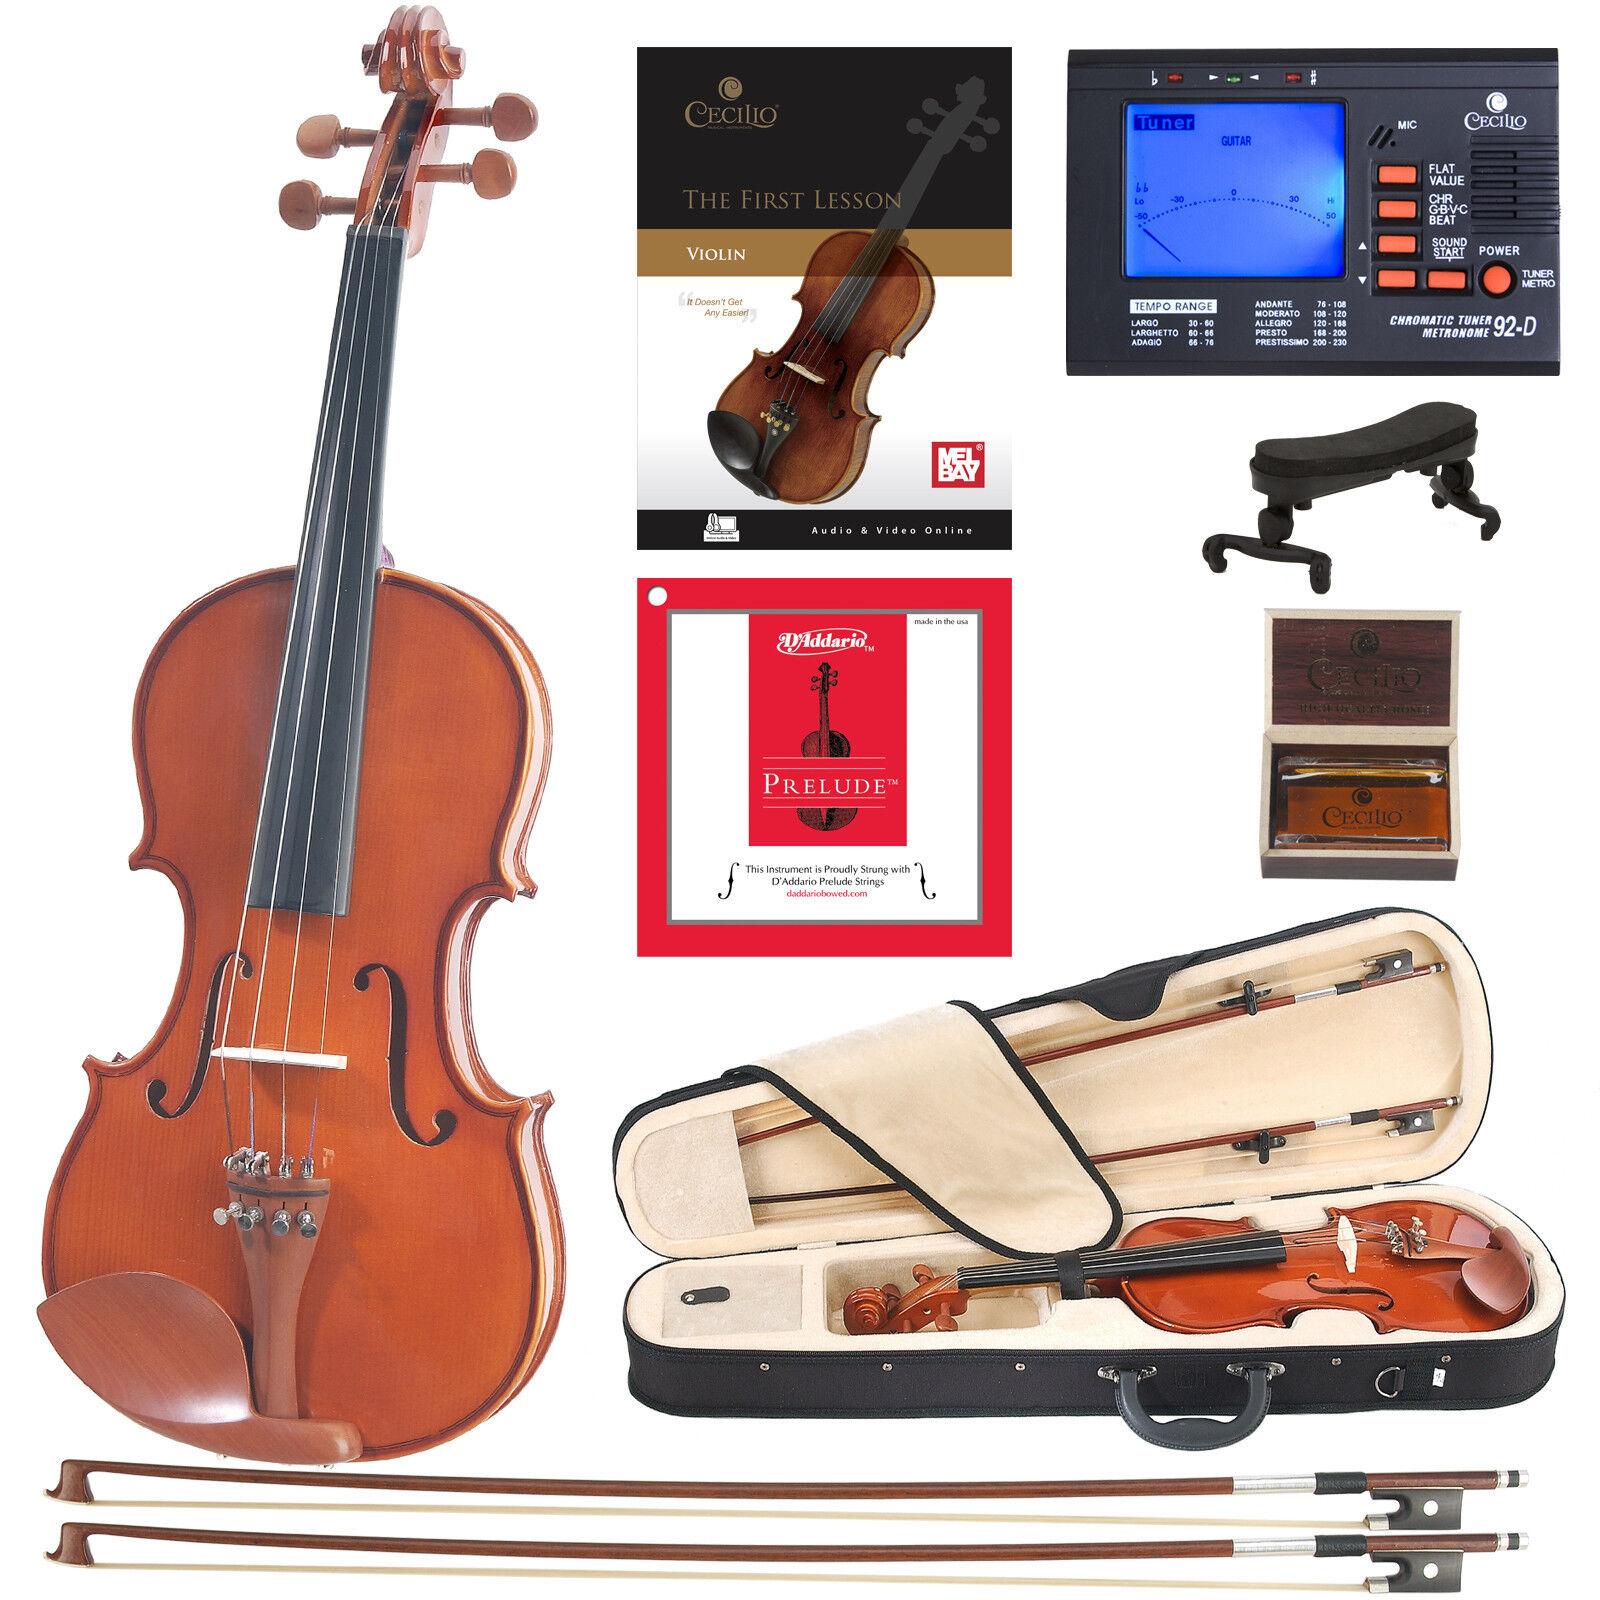 Cecilio CVN-200 Solidwood Violin with D'Addario Prelude Strings, Size 4 4